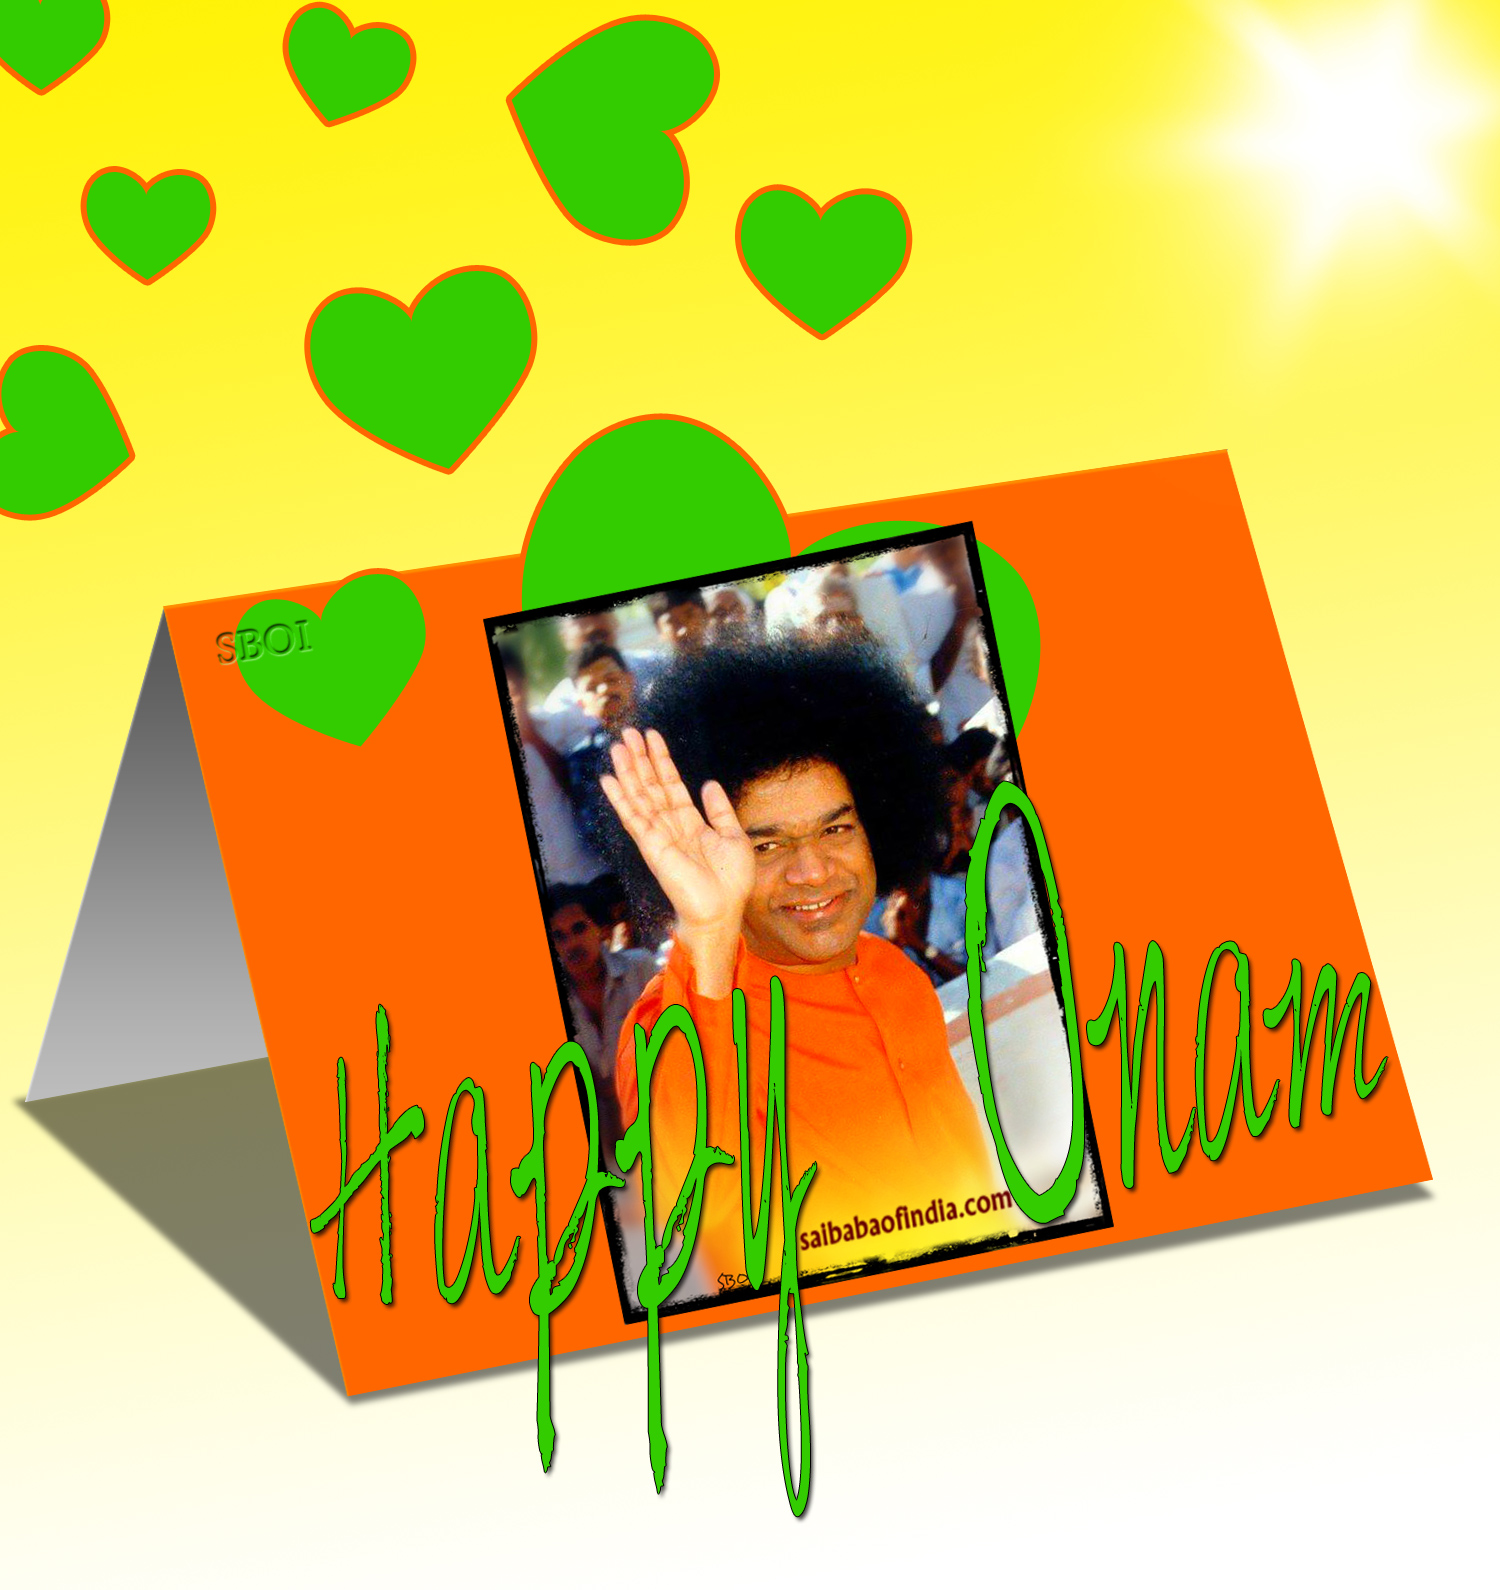 Sai baba onam photos onam updates from puttaparthi greeting cards sai baba sri sathya sai baba onam wallpapers m4hsunfo